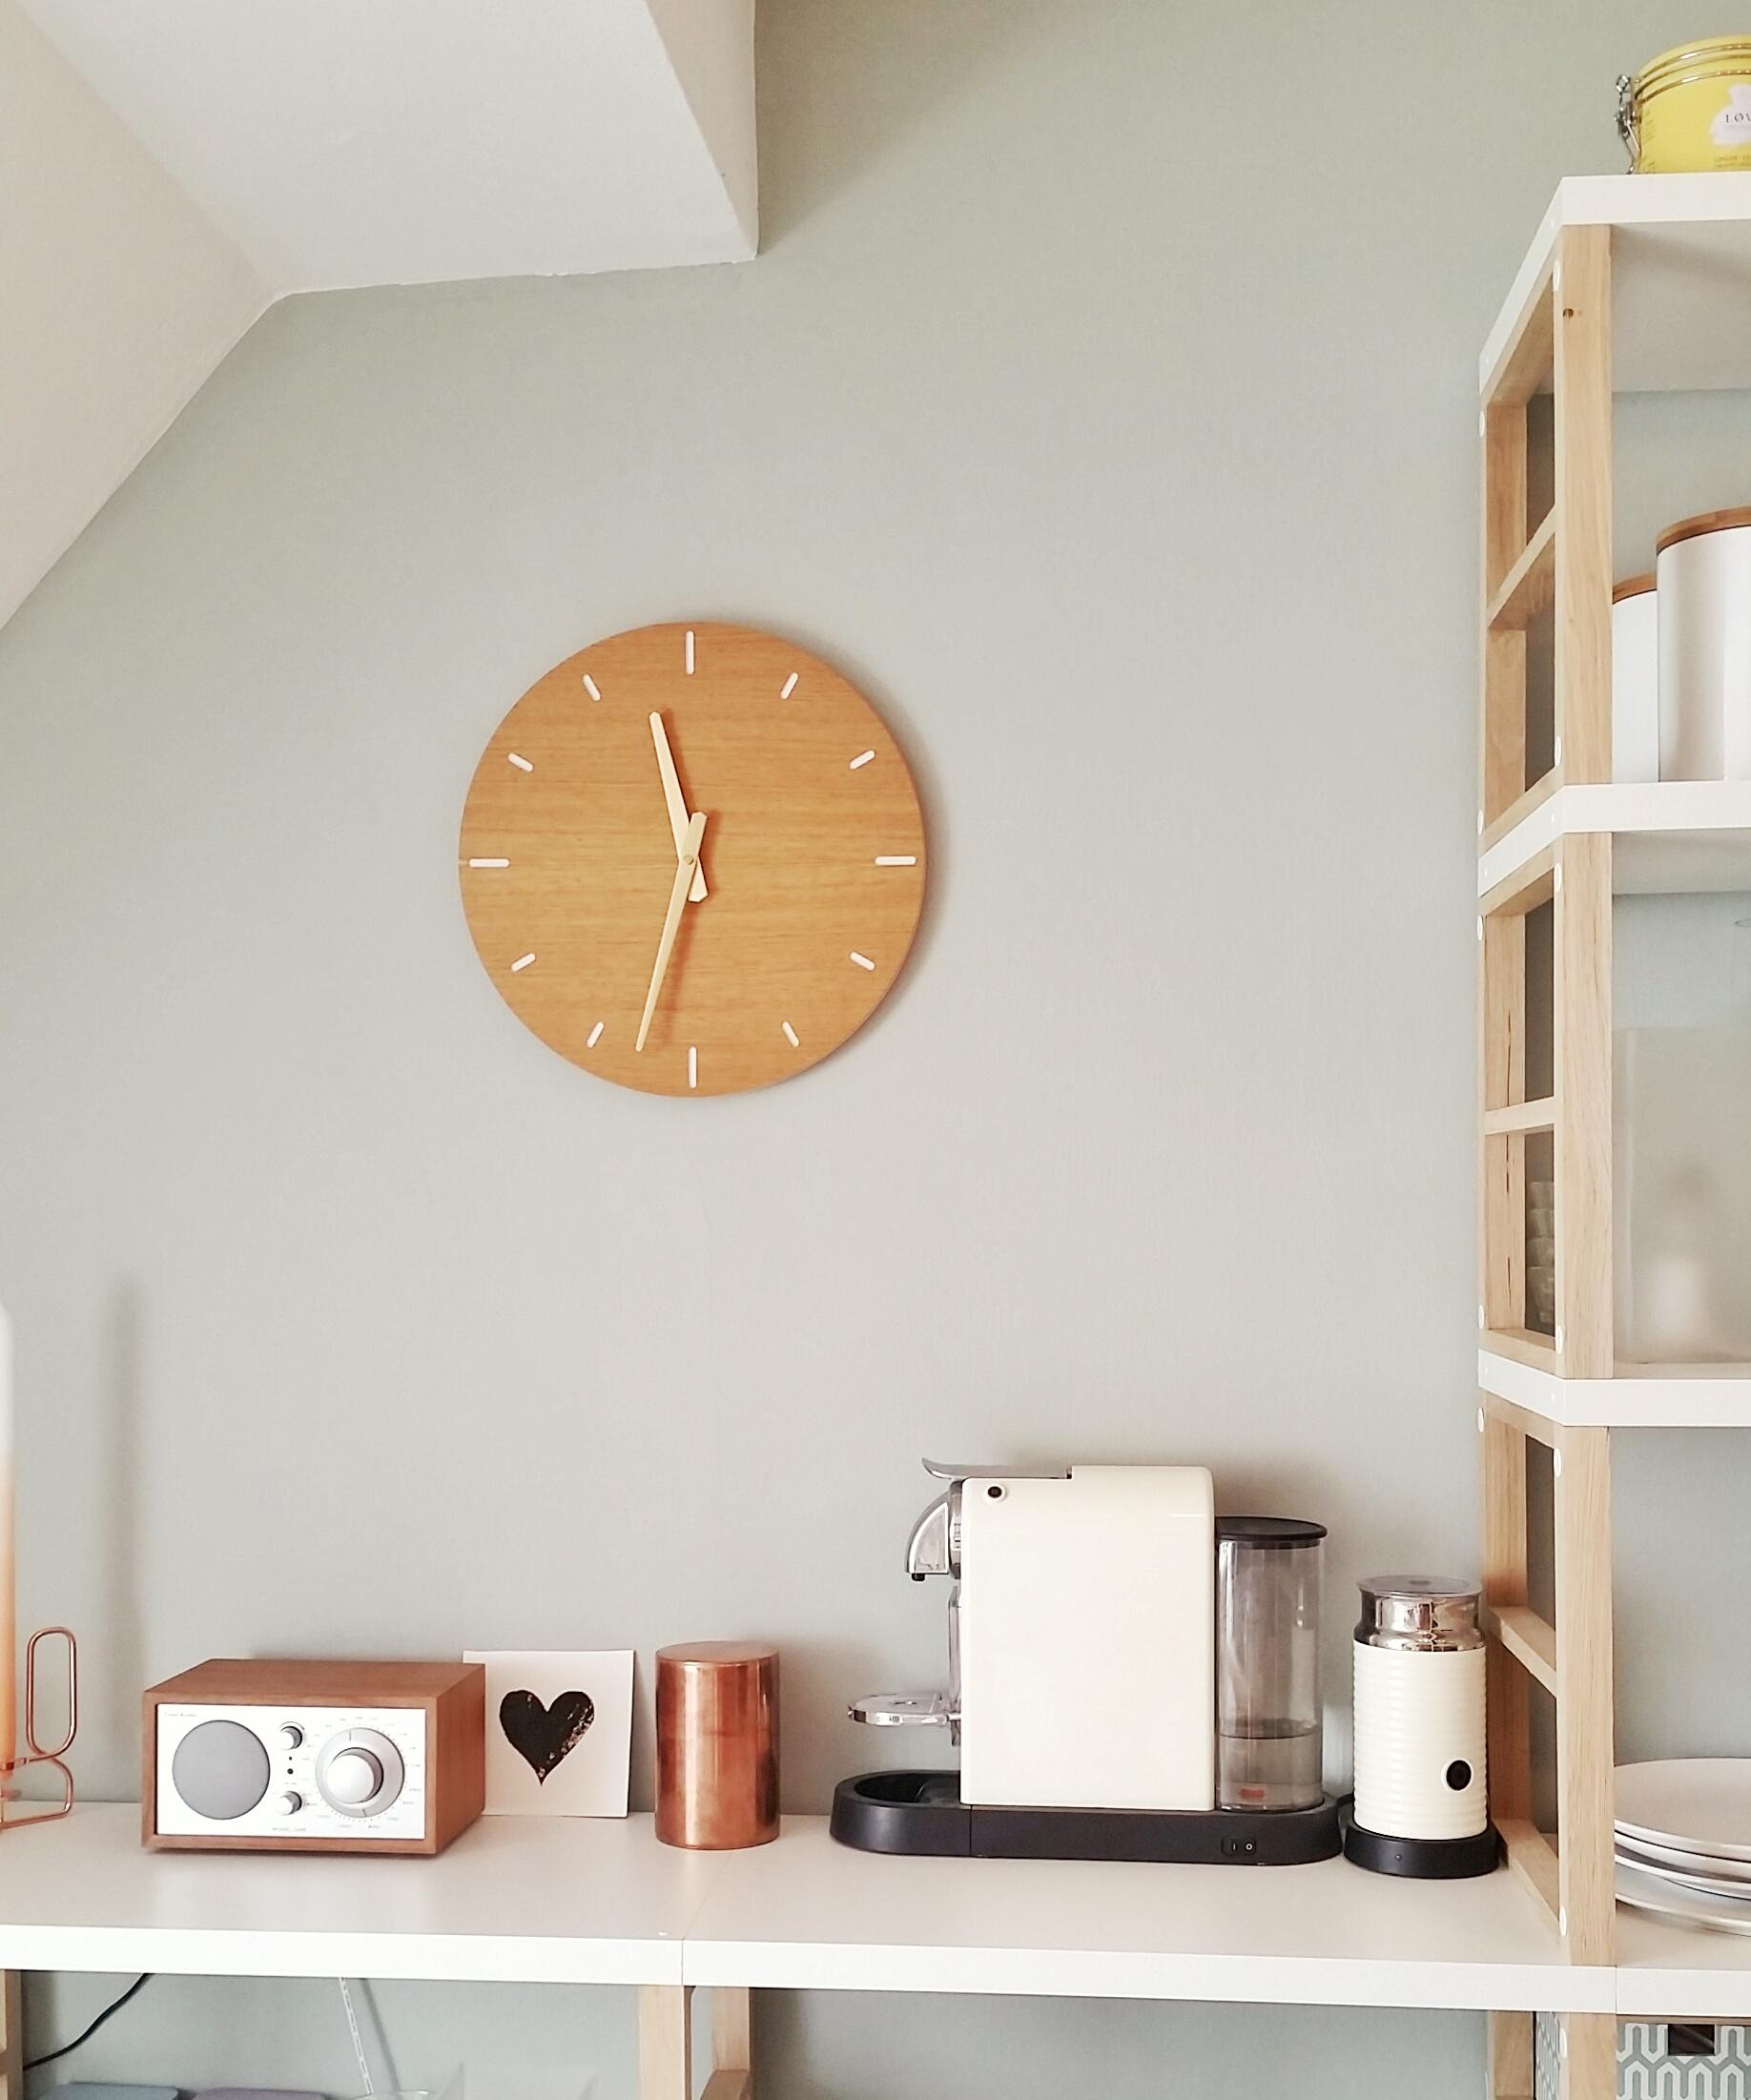 freie wildbahn unsere wanduhr klotzaufklotz. Black Bedroom Furniture Sets. Home Design Ideas